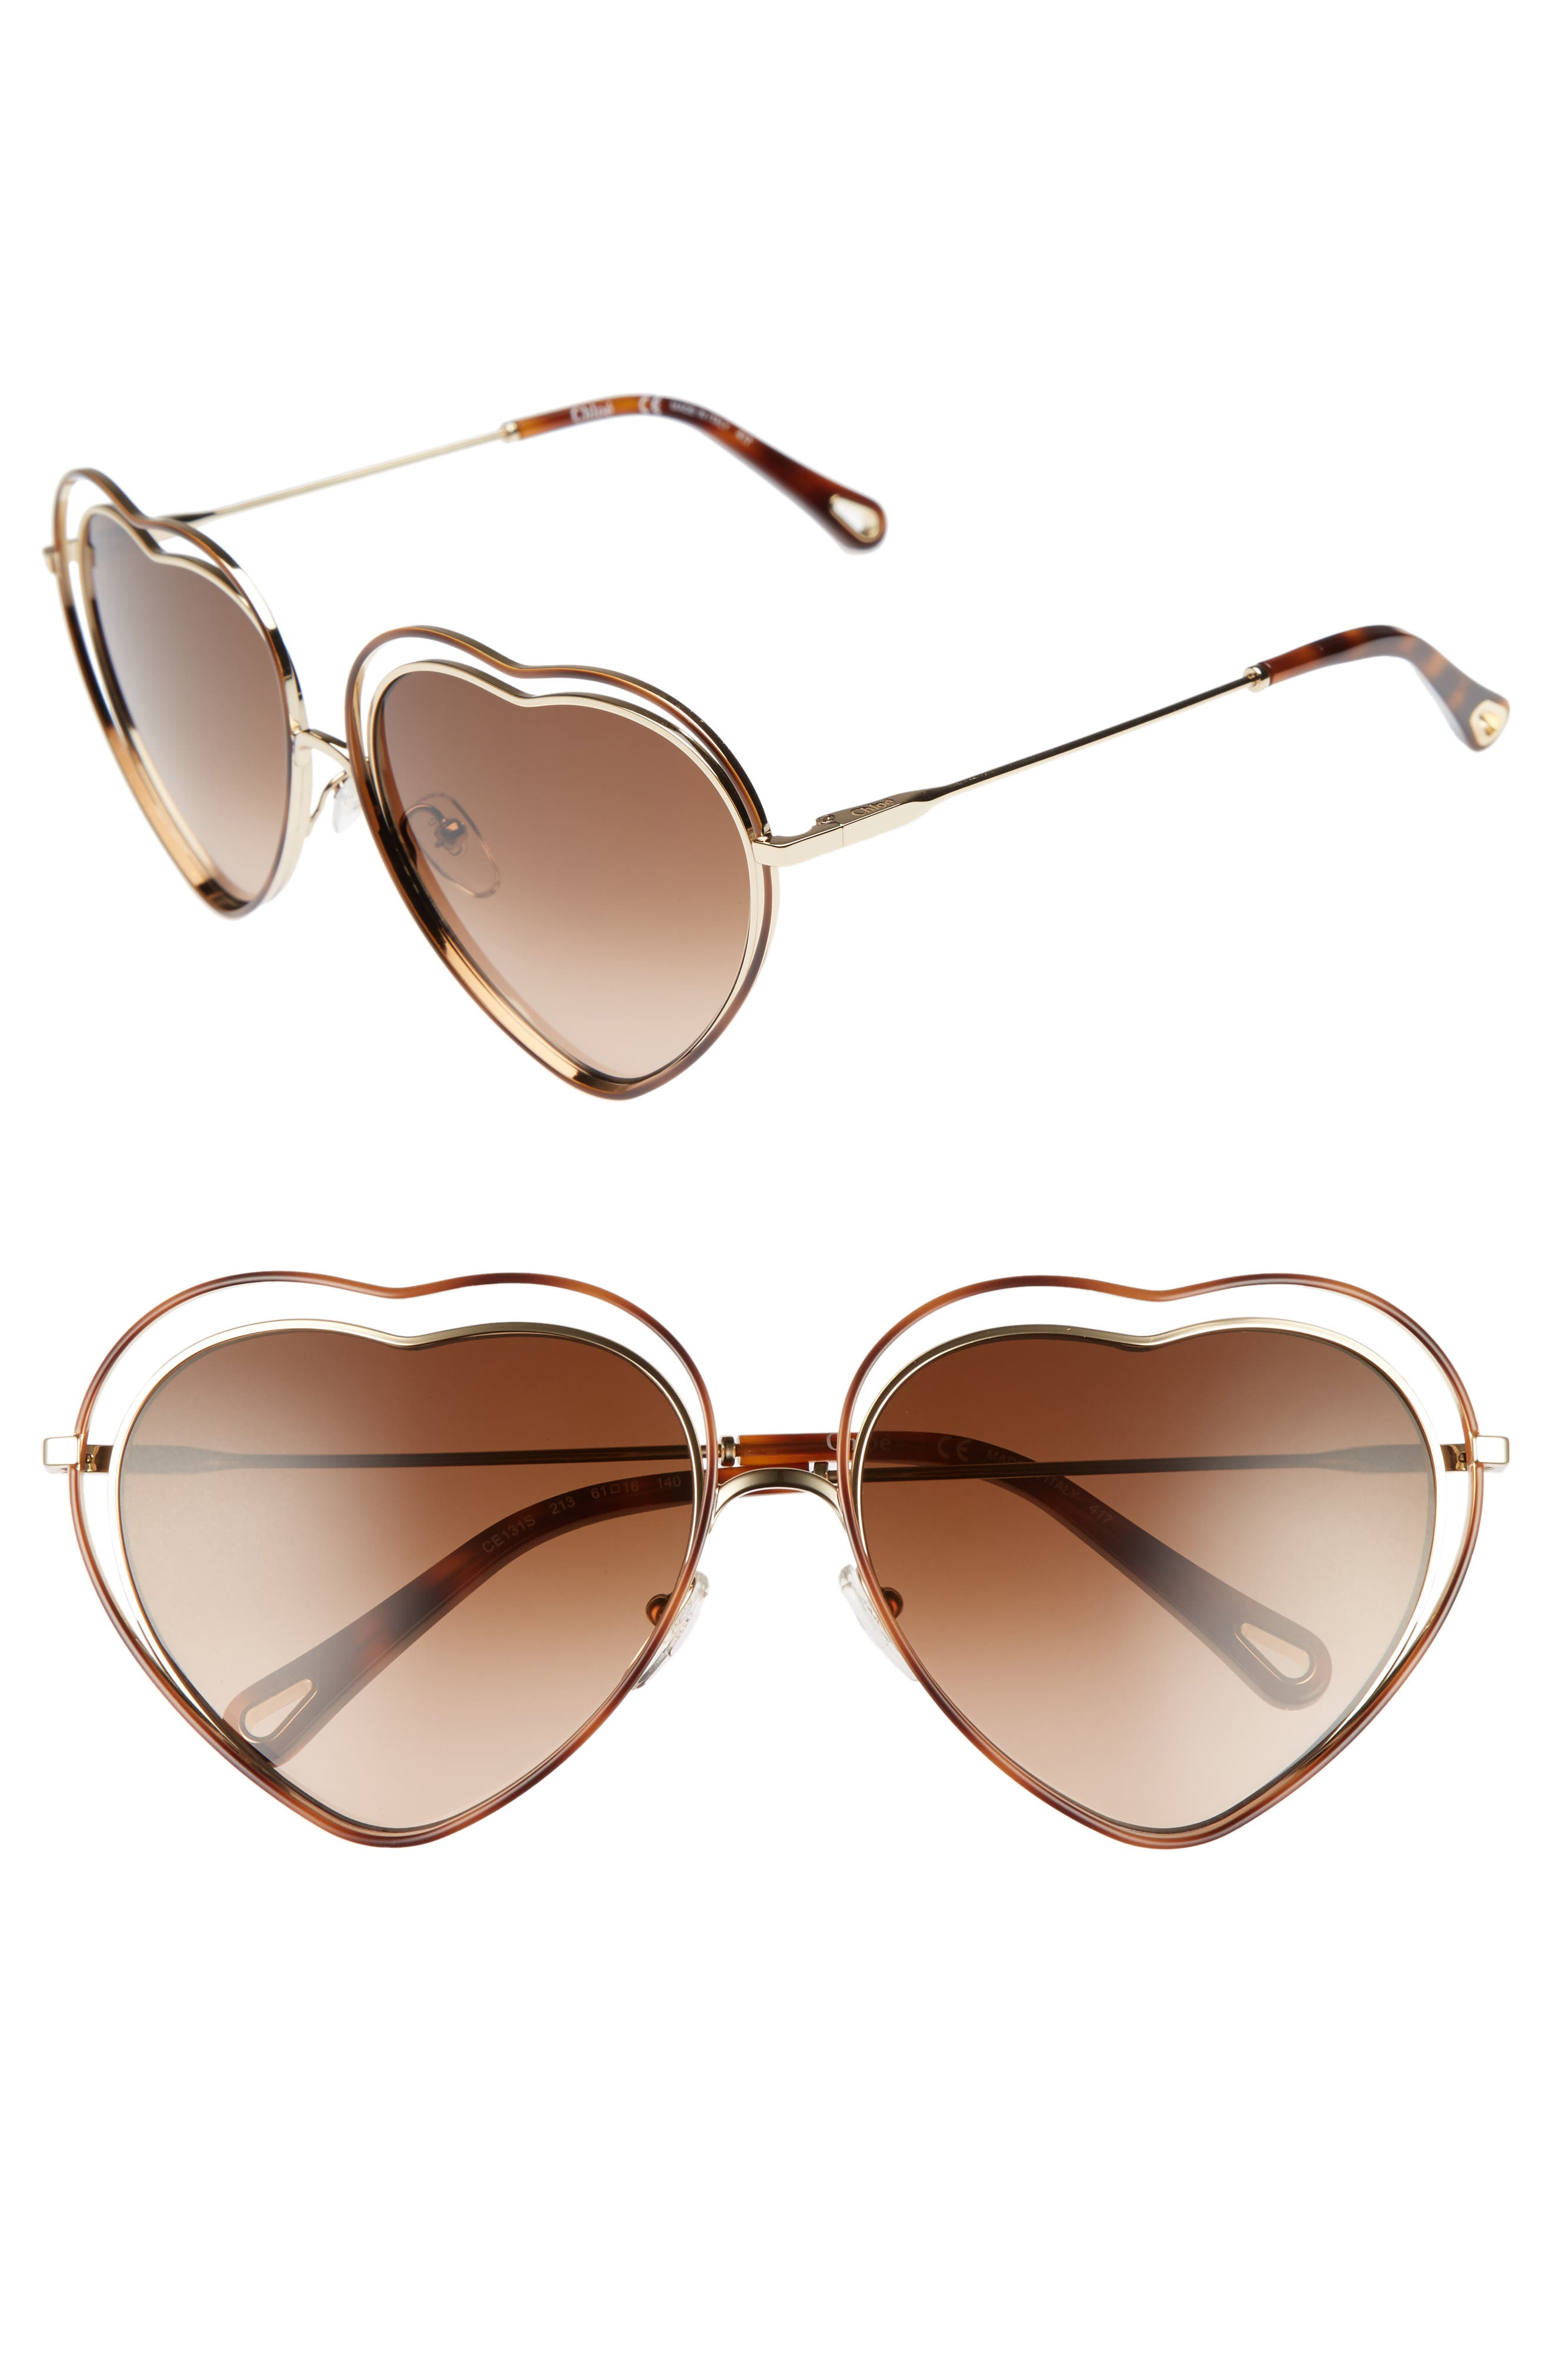 Poppy Love Heart Sunglasses,                         Main,                         color, Havana Brown